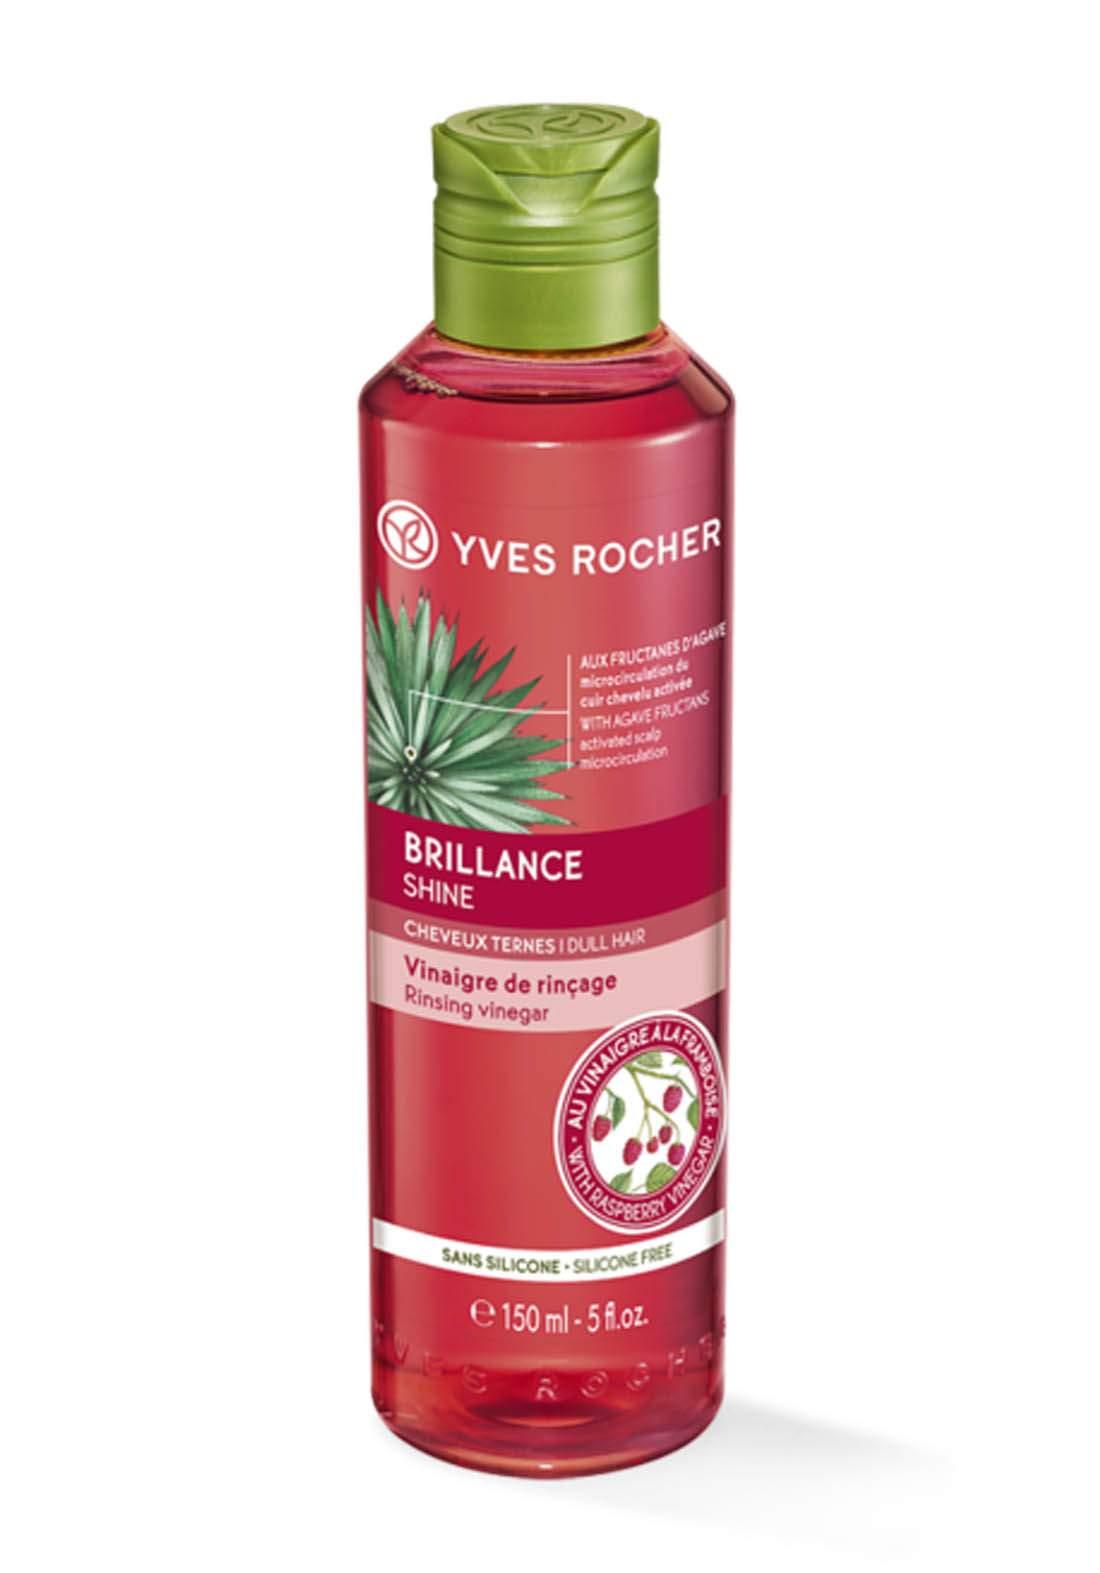 Yves Rocher 64871 Shine - Rinsing Vinegar 150ml خل التوت